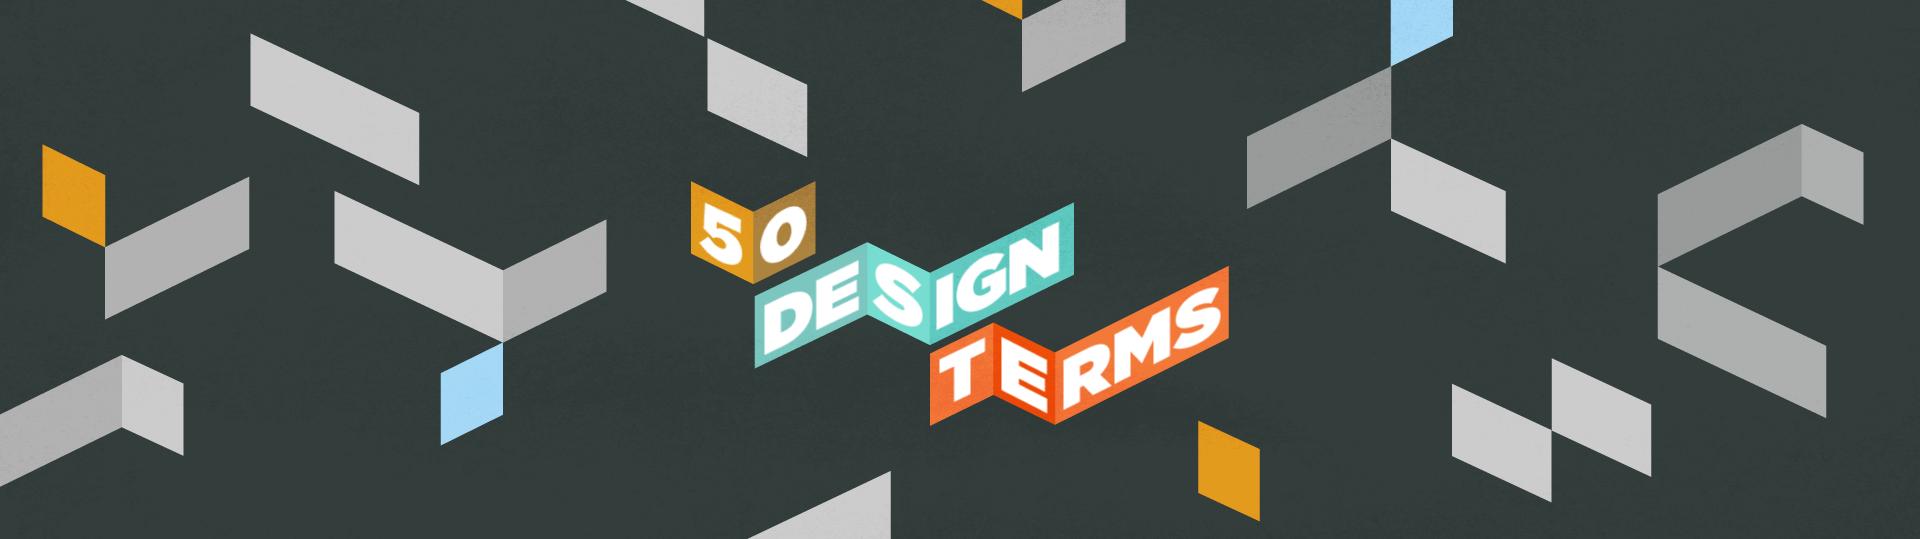 50DesignTerms